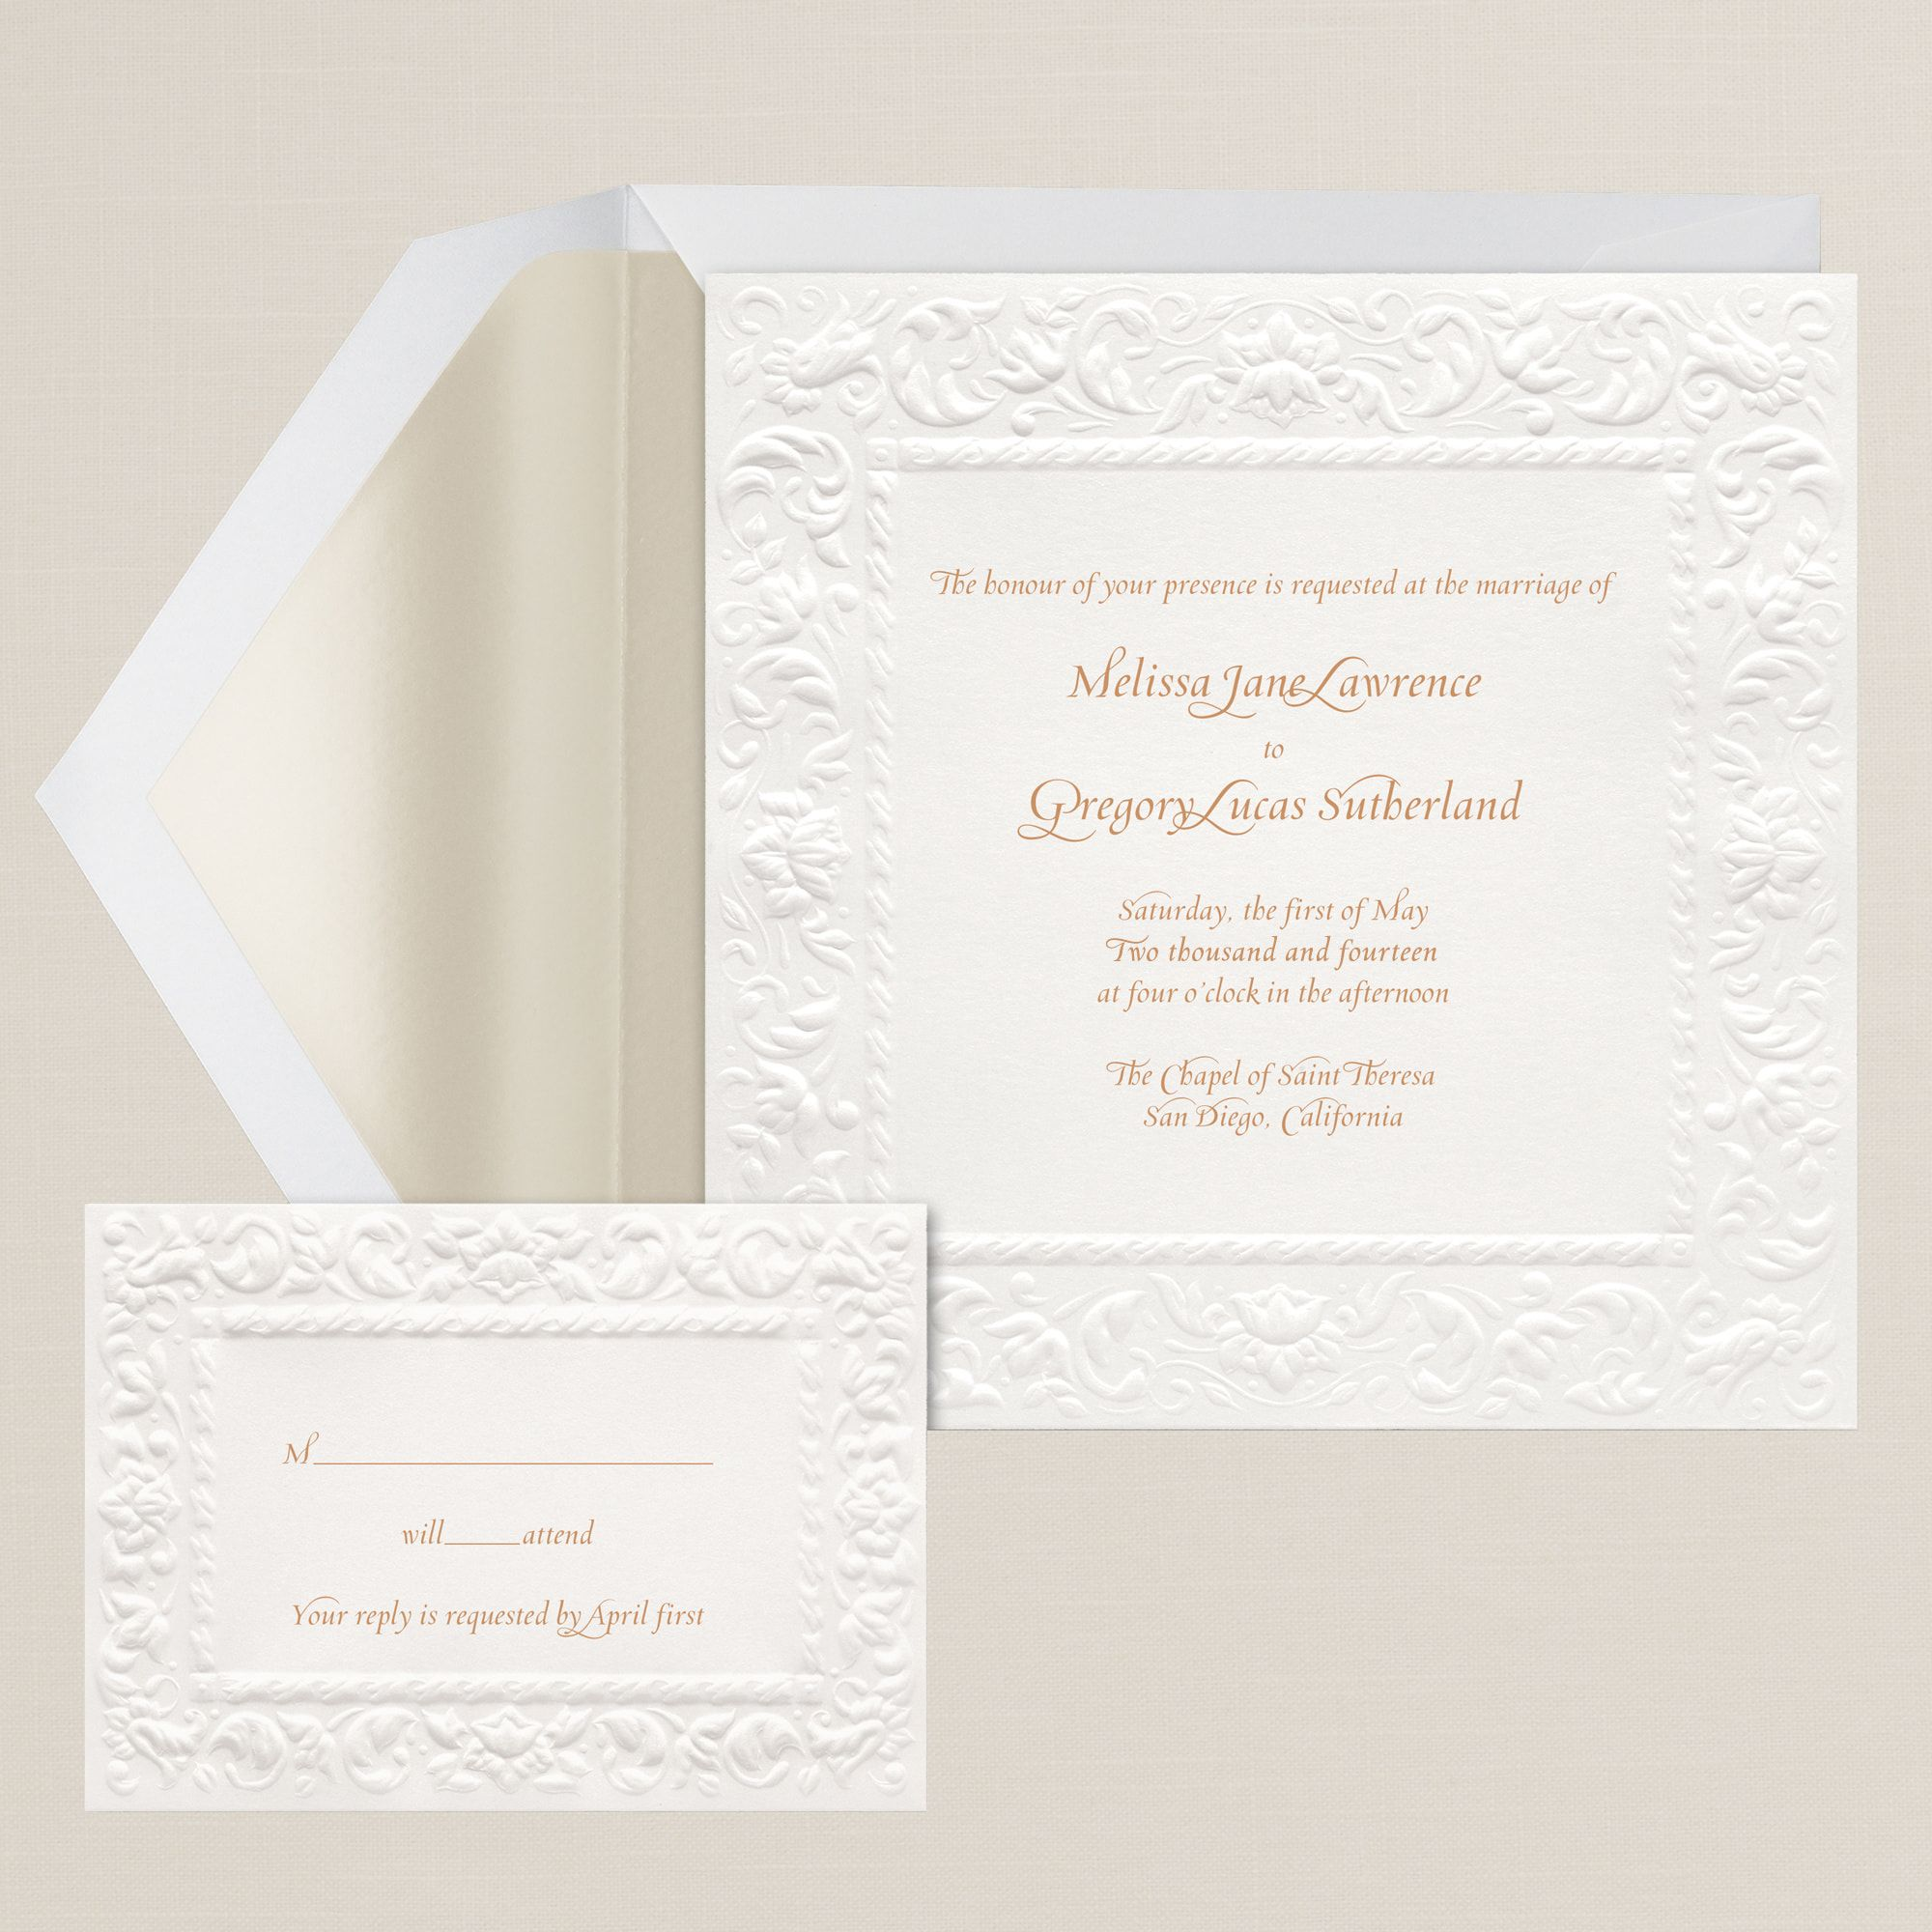 Old World Elegance: Old World Elegance Wedding Invitation